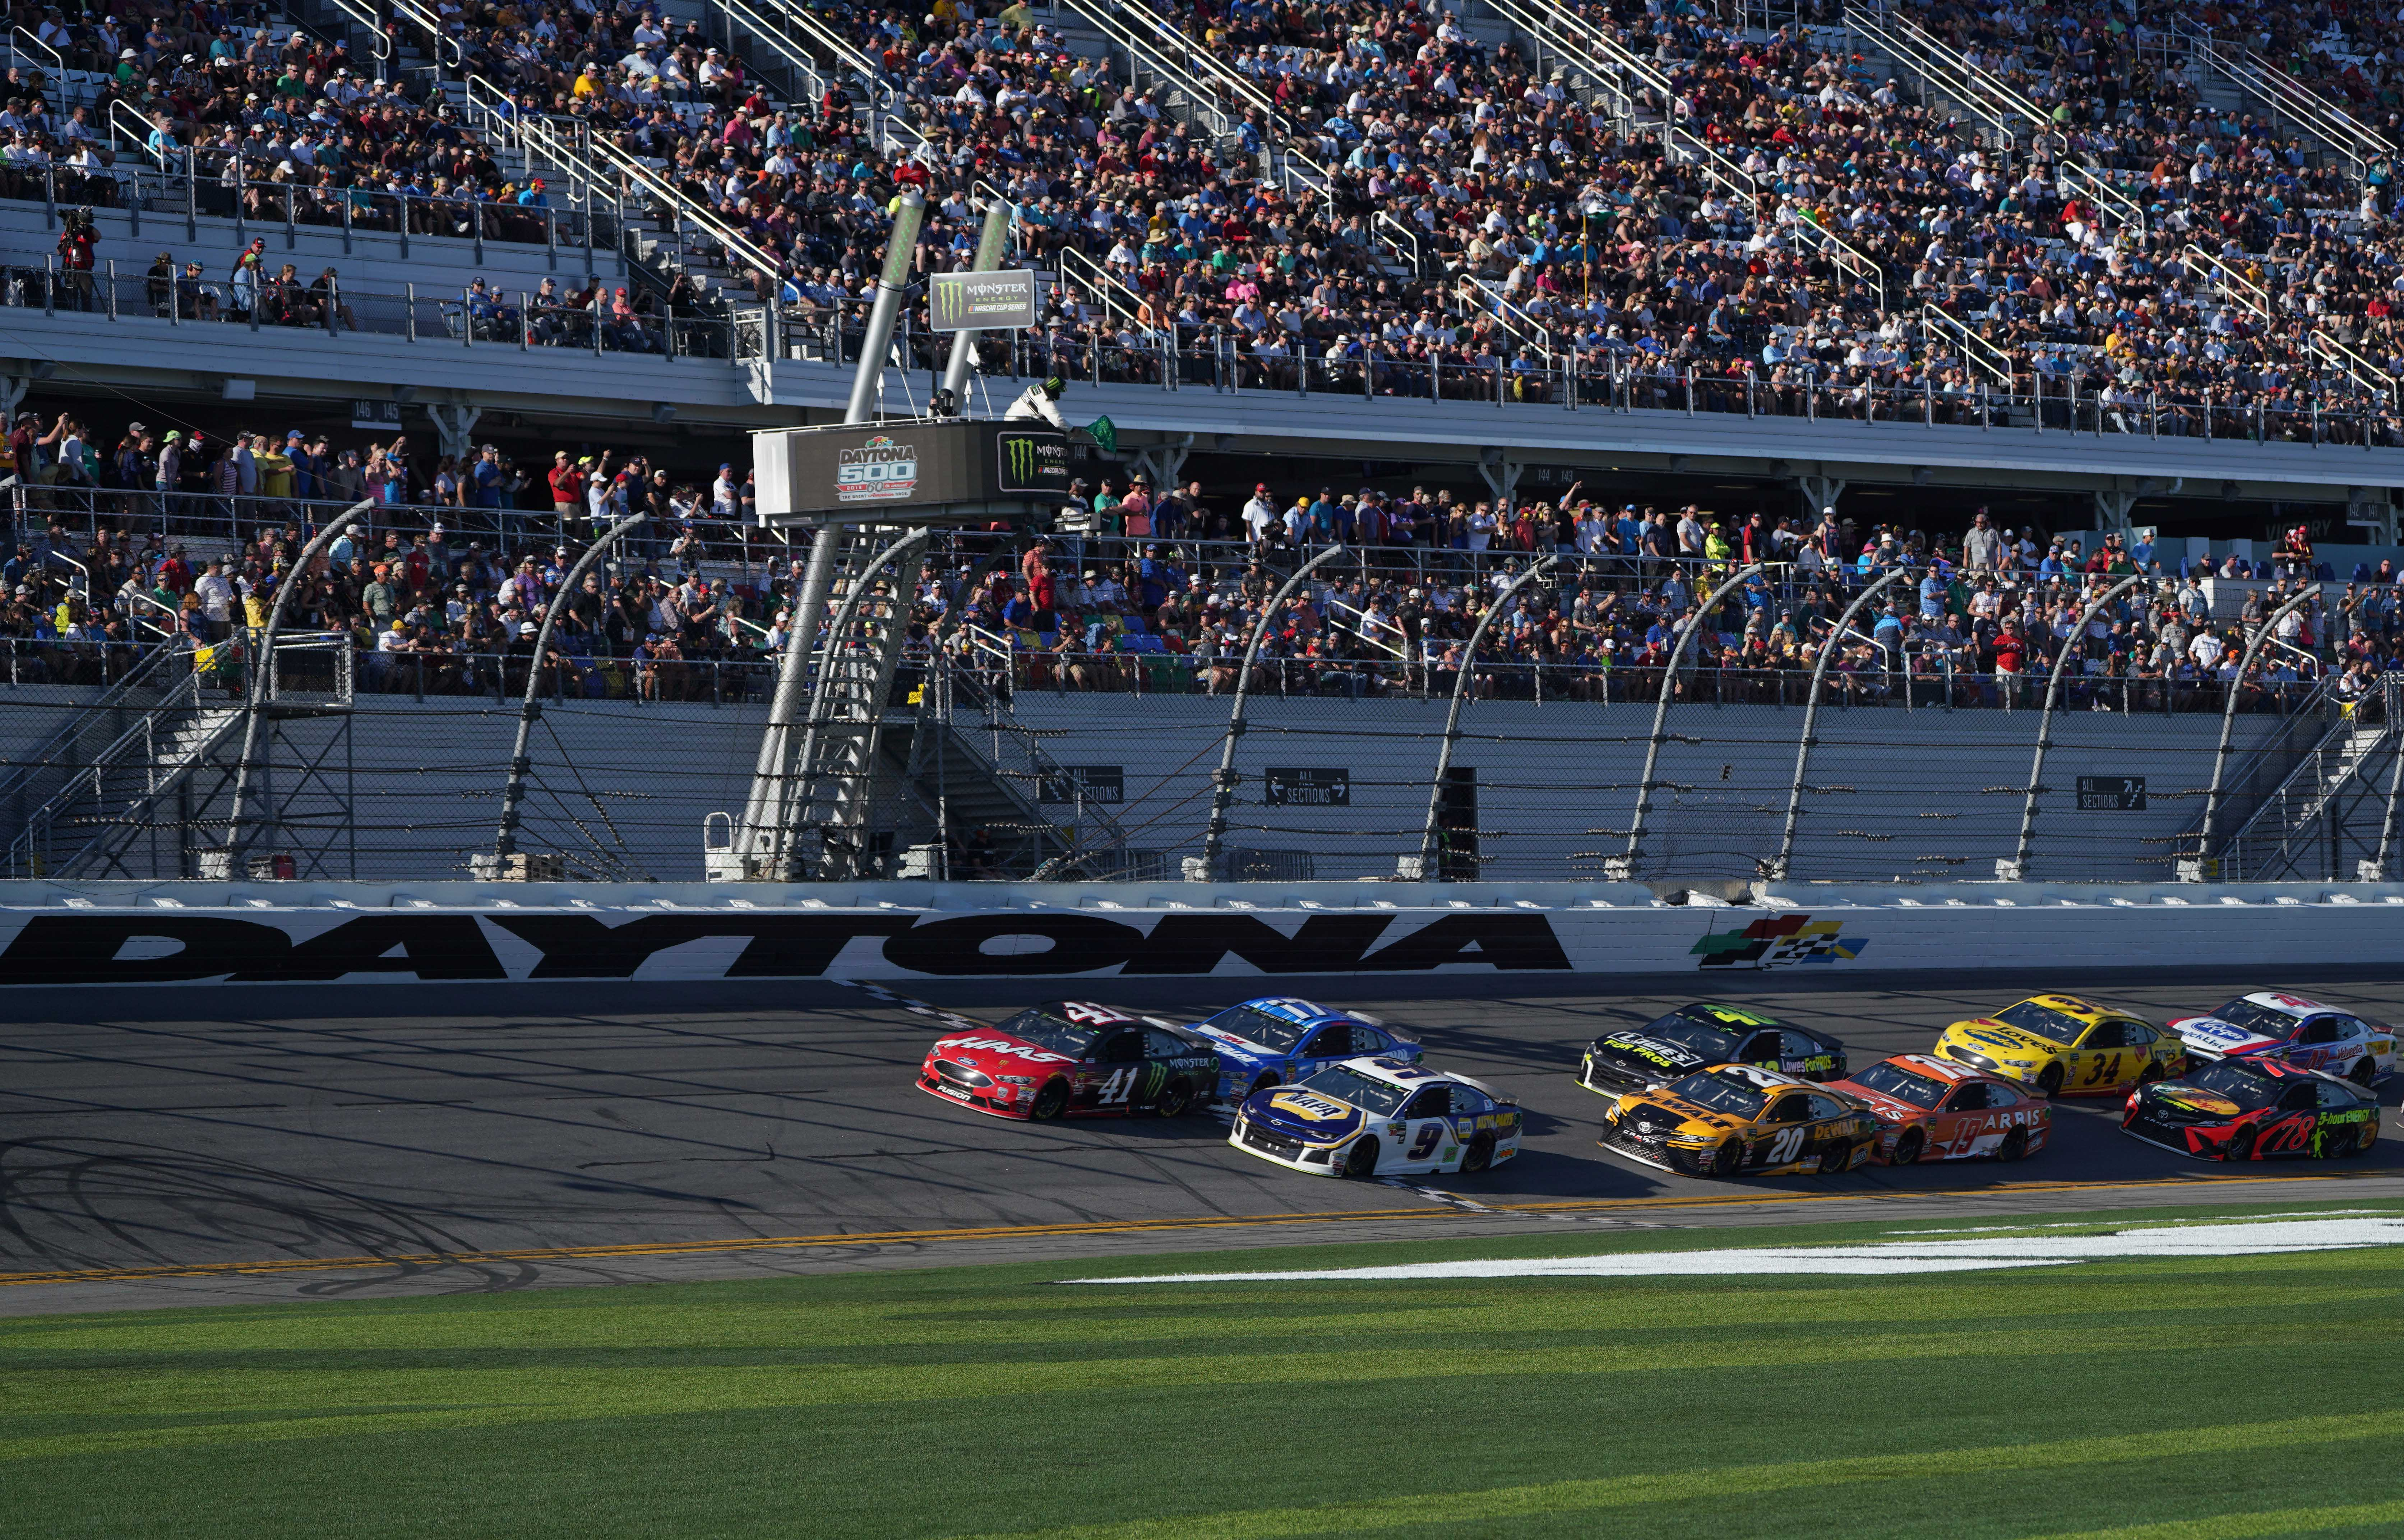 Daytona 500 2019: Key information for the NASCAR Cup Series season-opener